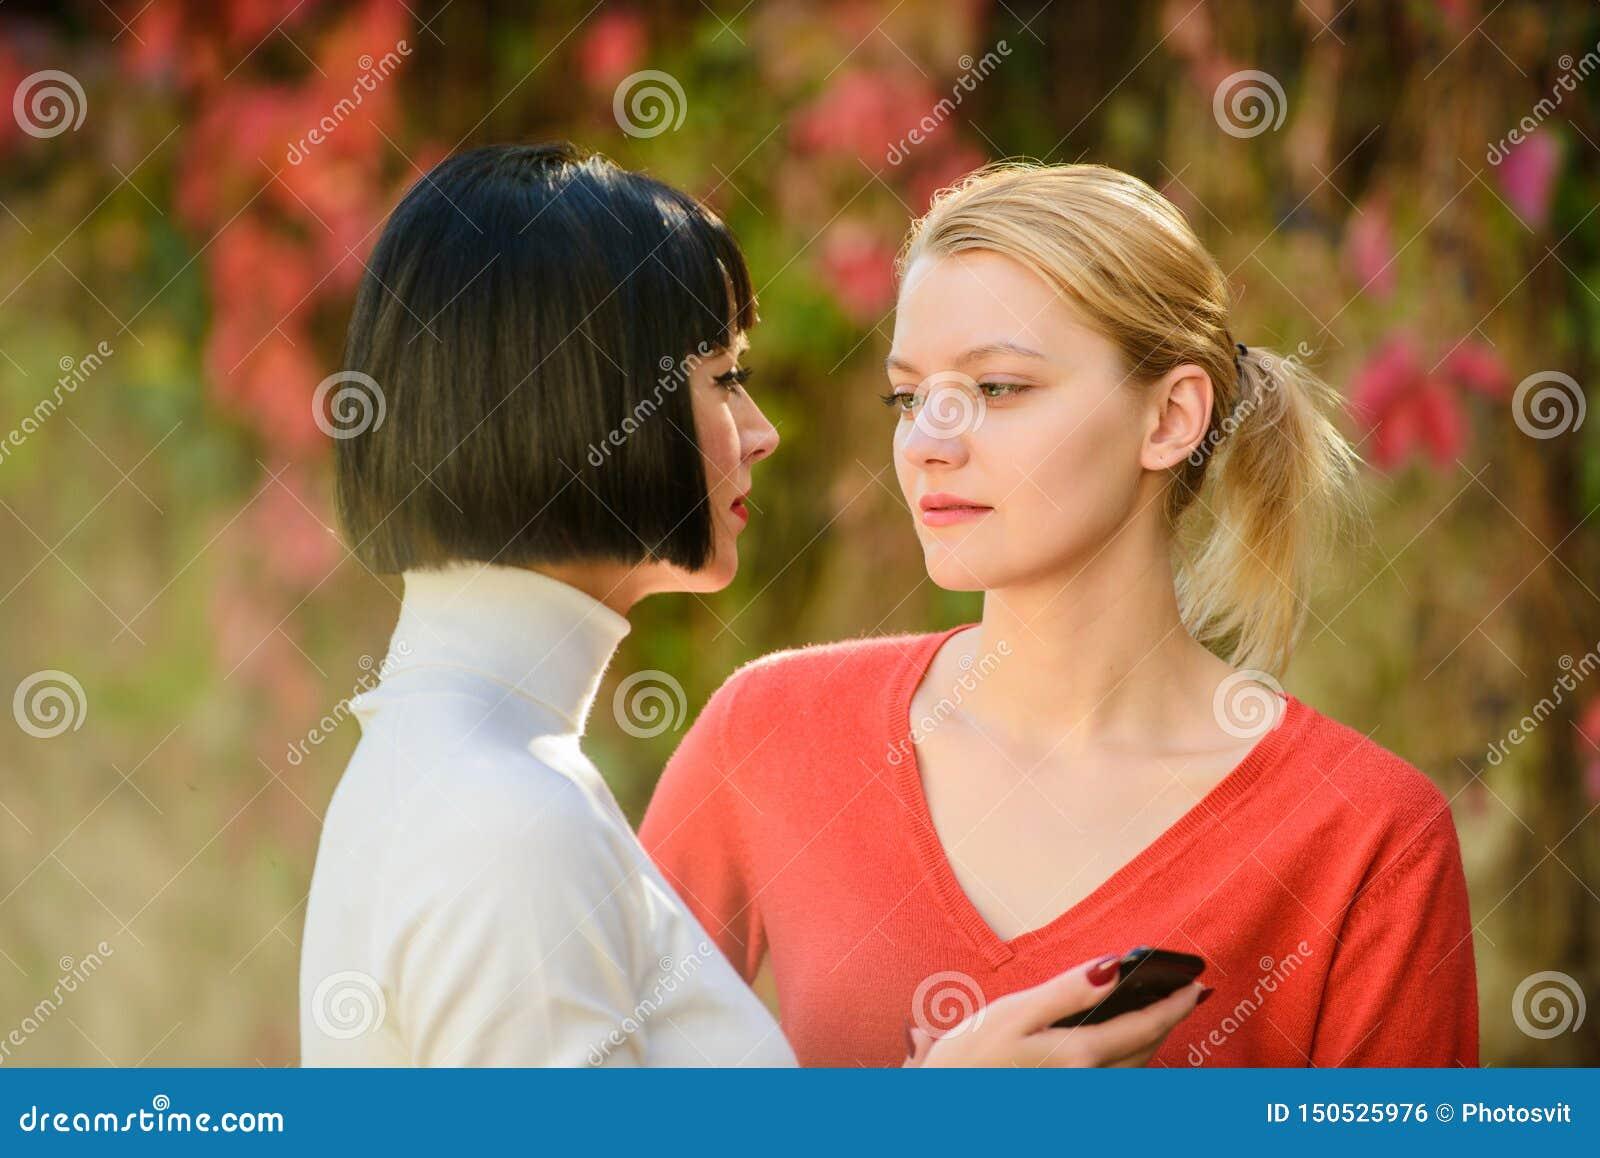 3g 4g mobile internet surfing. digital marketing. women use phone. new technology. buy online on cyber monday. black